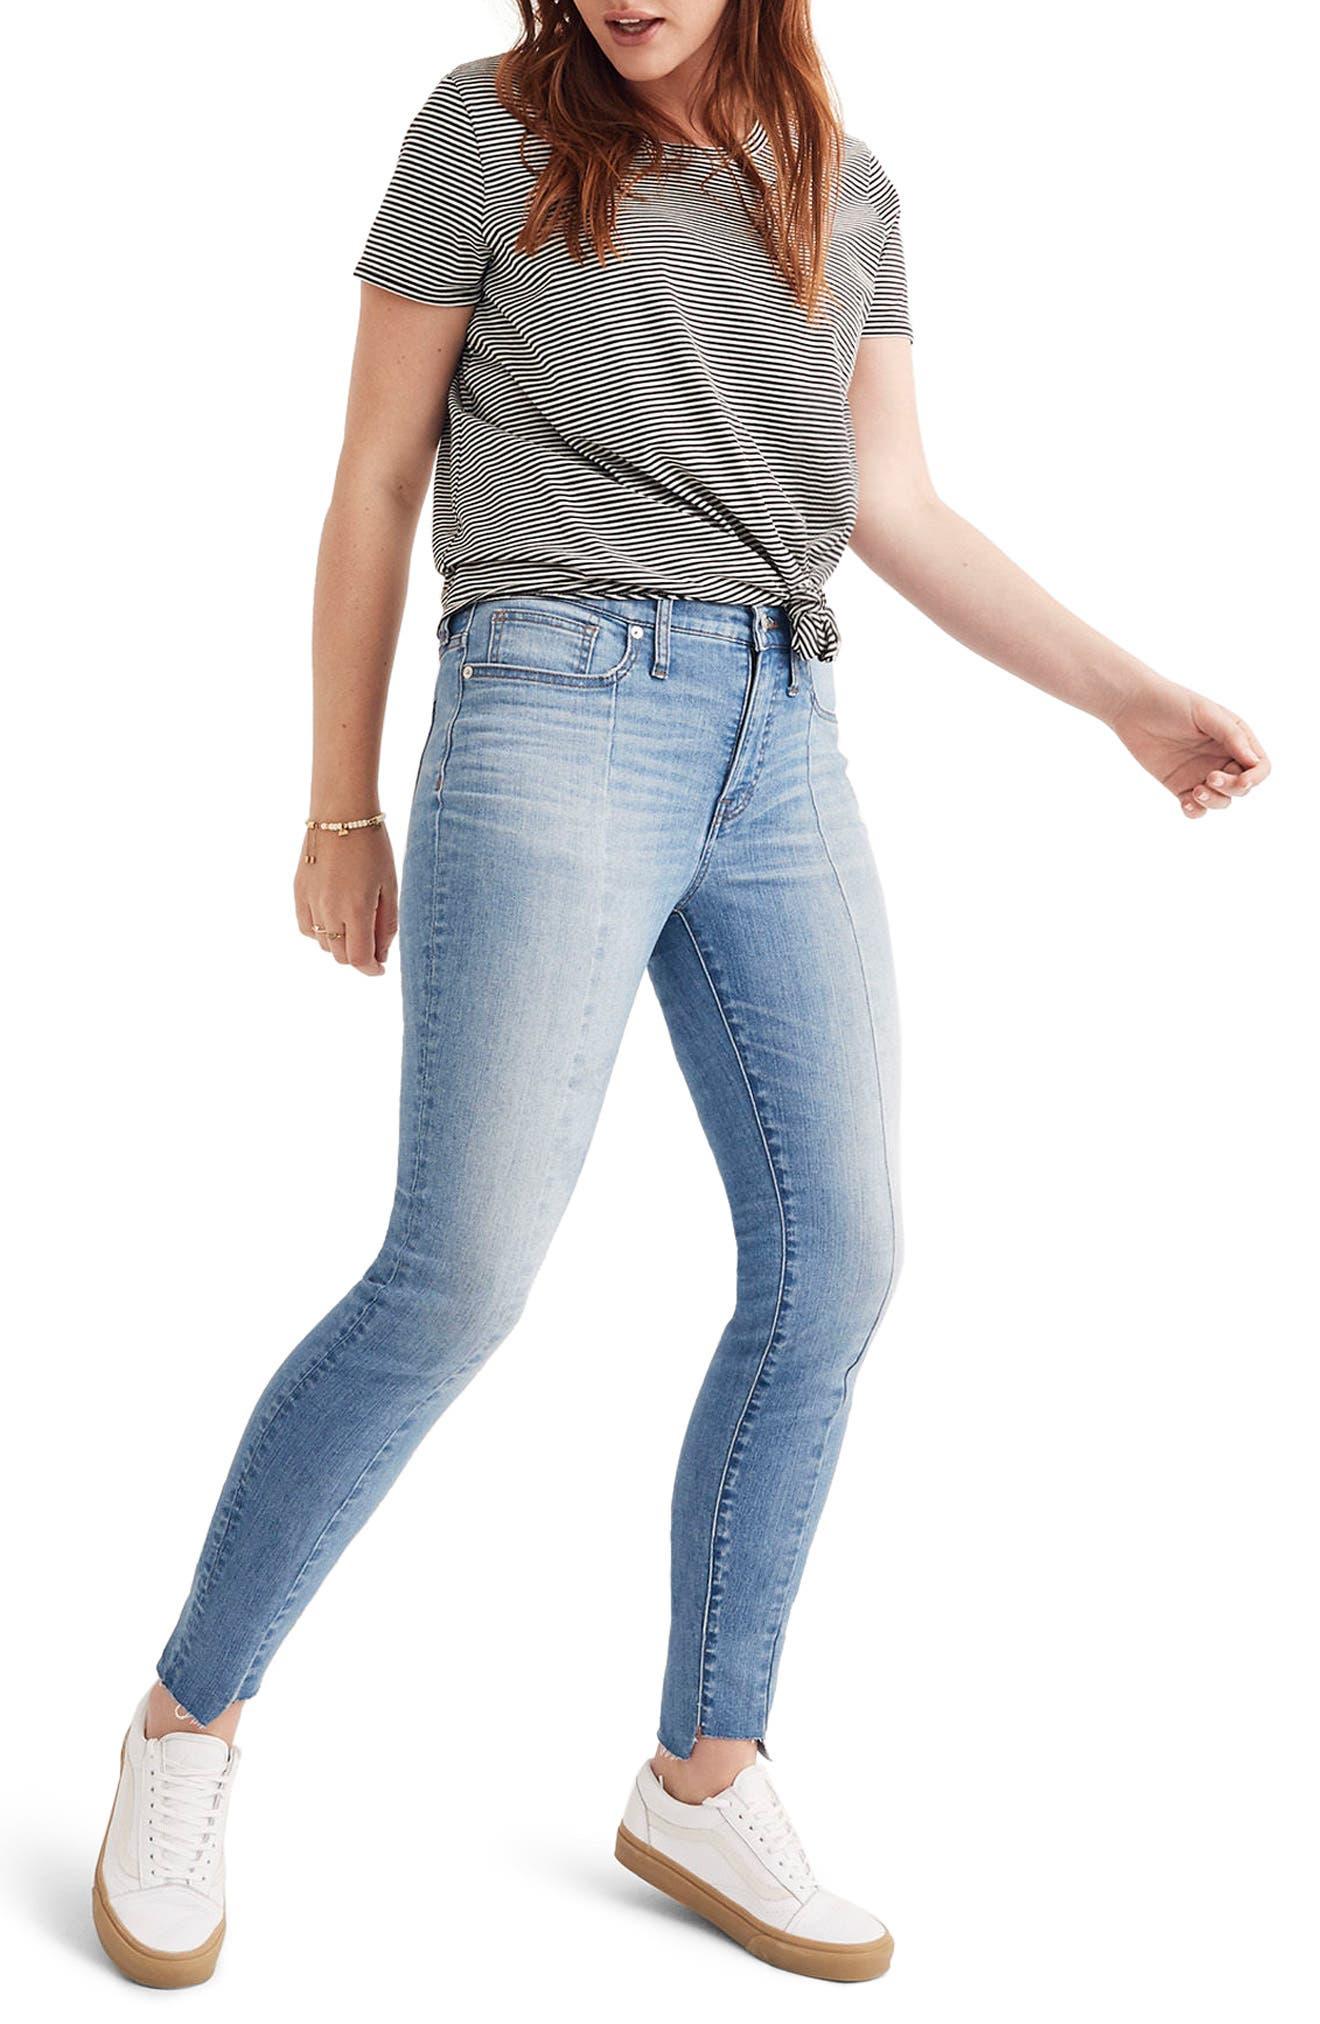 MADEWELL 9-Inch High Waist Seamed Step-Hem Edition Skinny Jeans, Main, color, 400